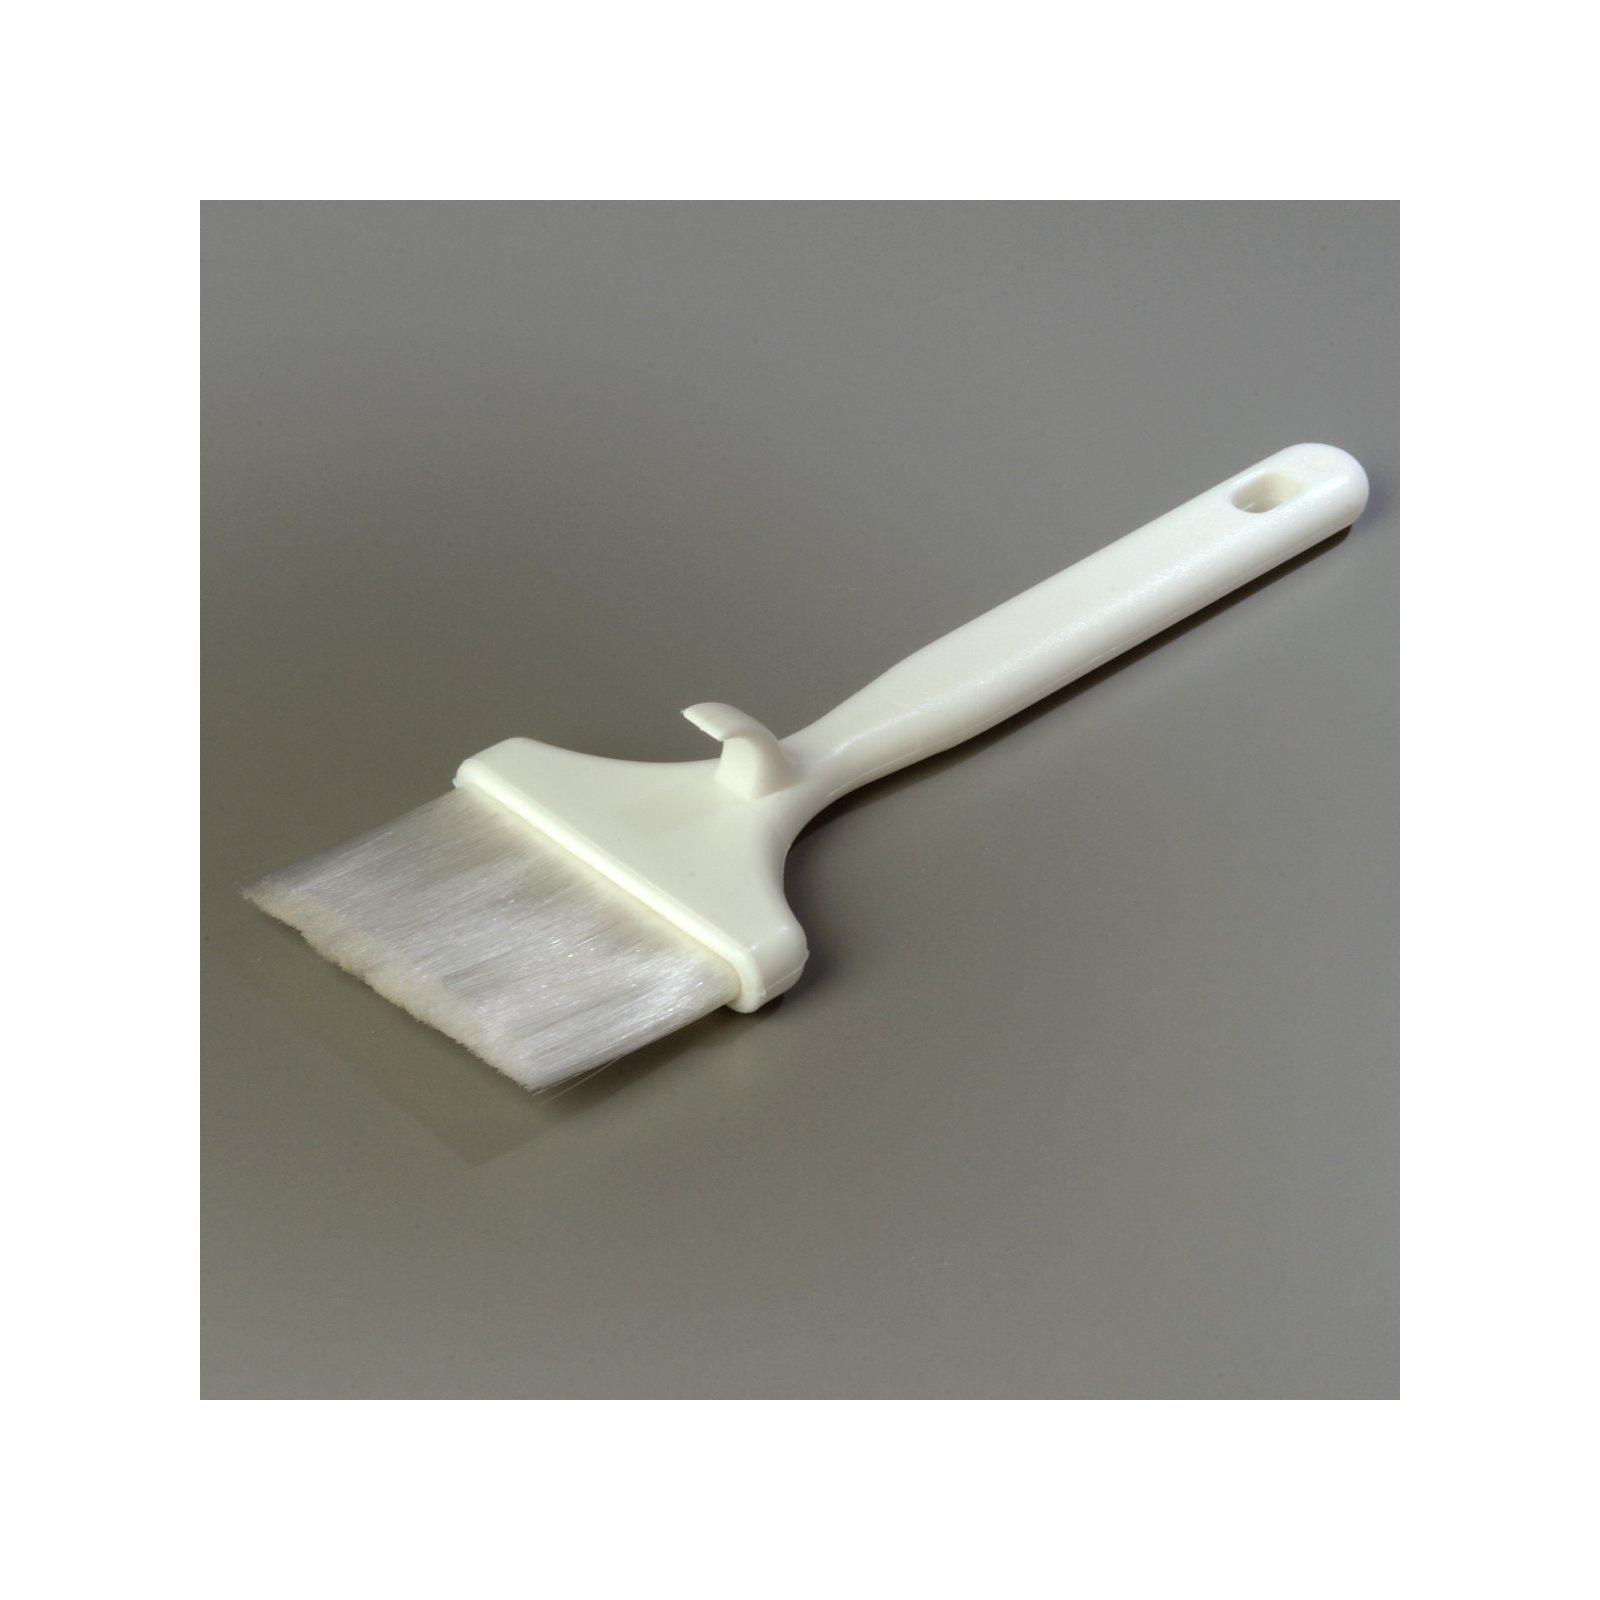 4040202 Sparta Meteor Nylon Bristle Basting Brush 3 White Carlisle Foodservice Products